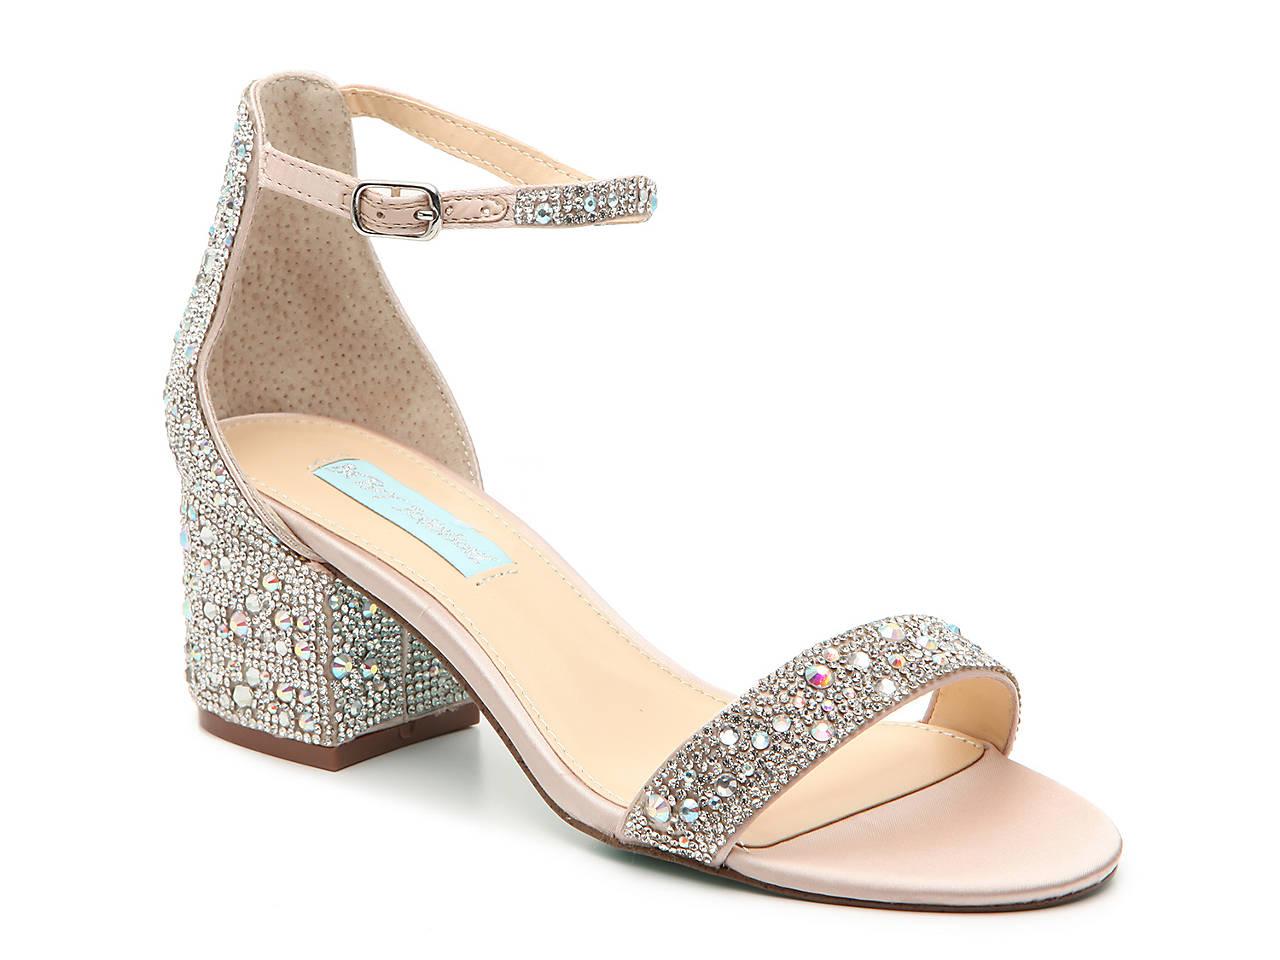 7804d4ff6 Betsey Johnson Mari Sandal Women s Shoes